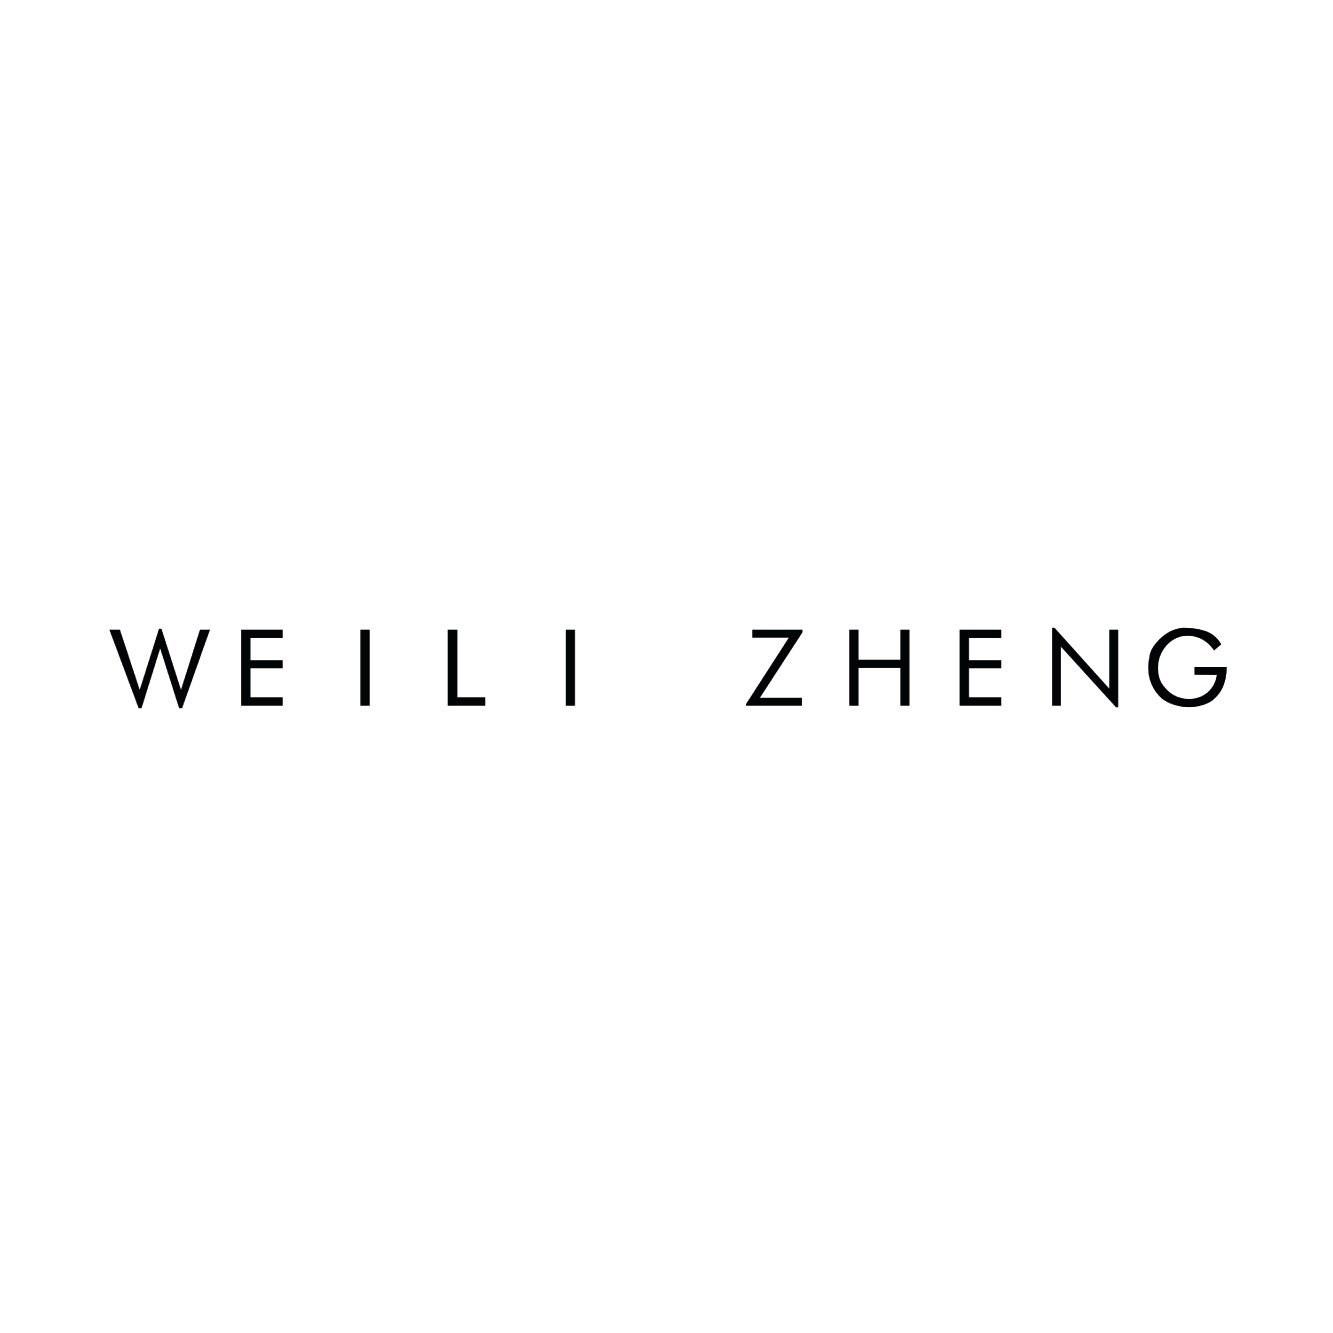 Weili Zheng